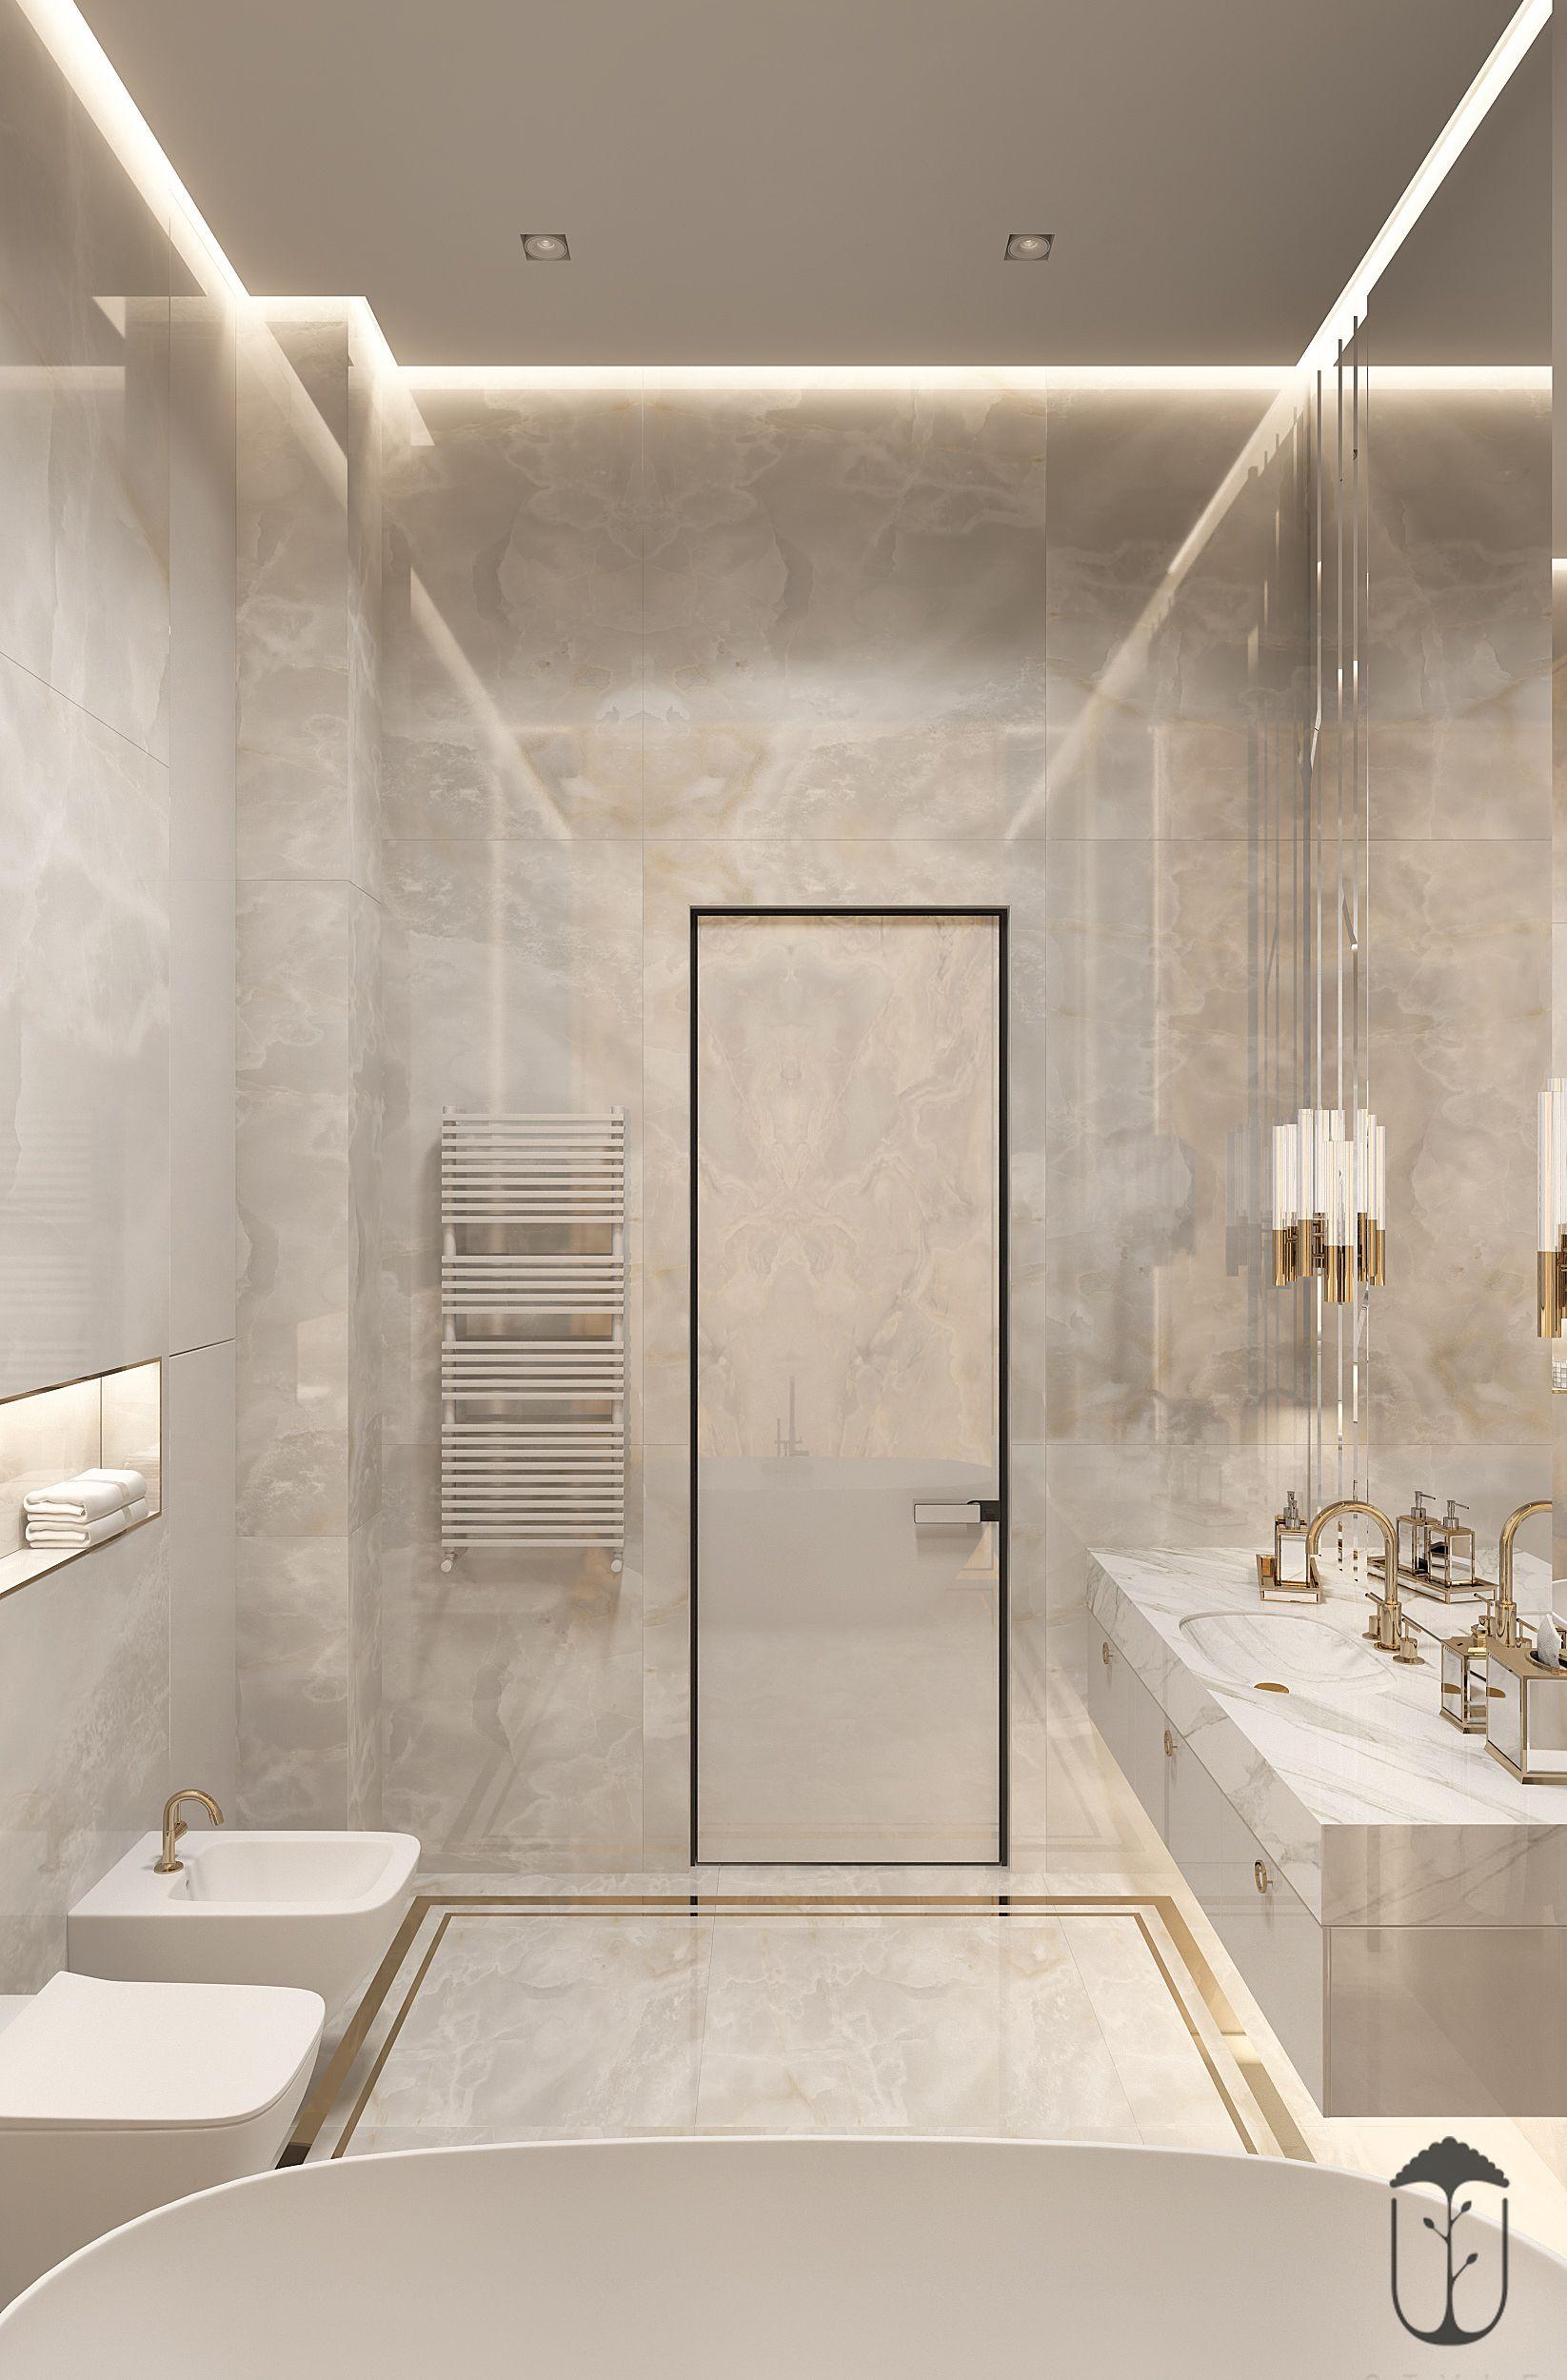 Pin By Coludxiao On Ui021 Bathroom Interior Modern Bathroom Design Luxury Bathroom